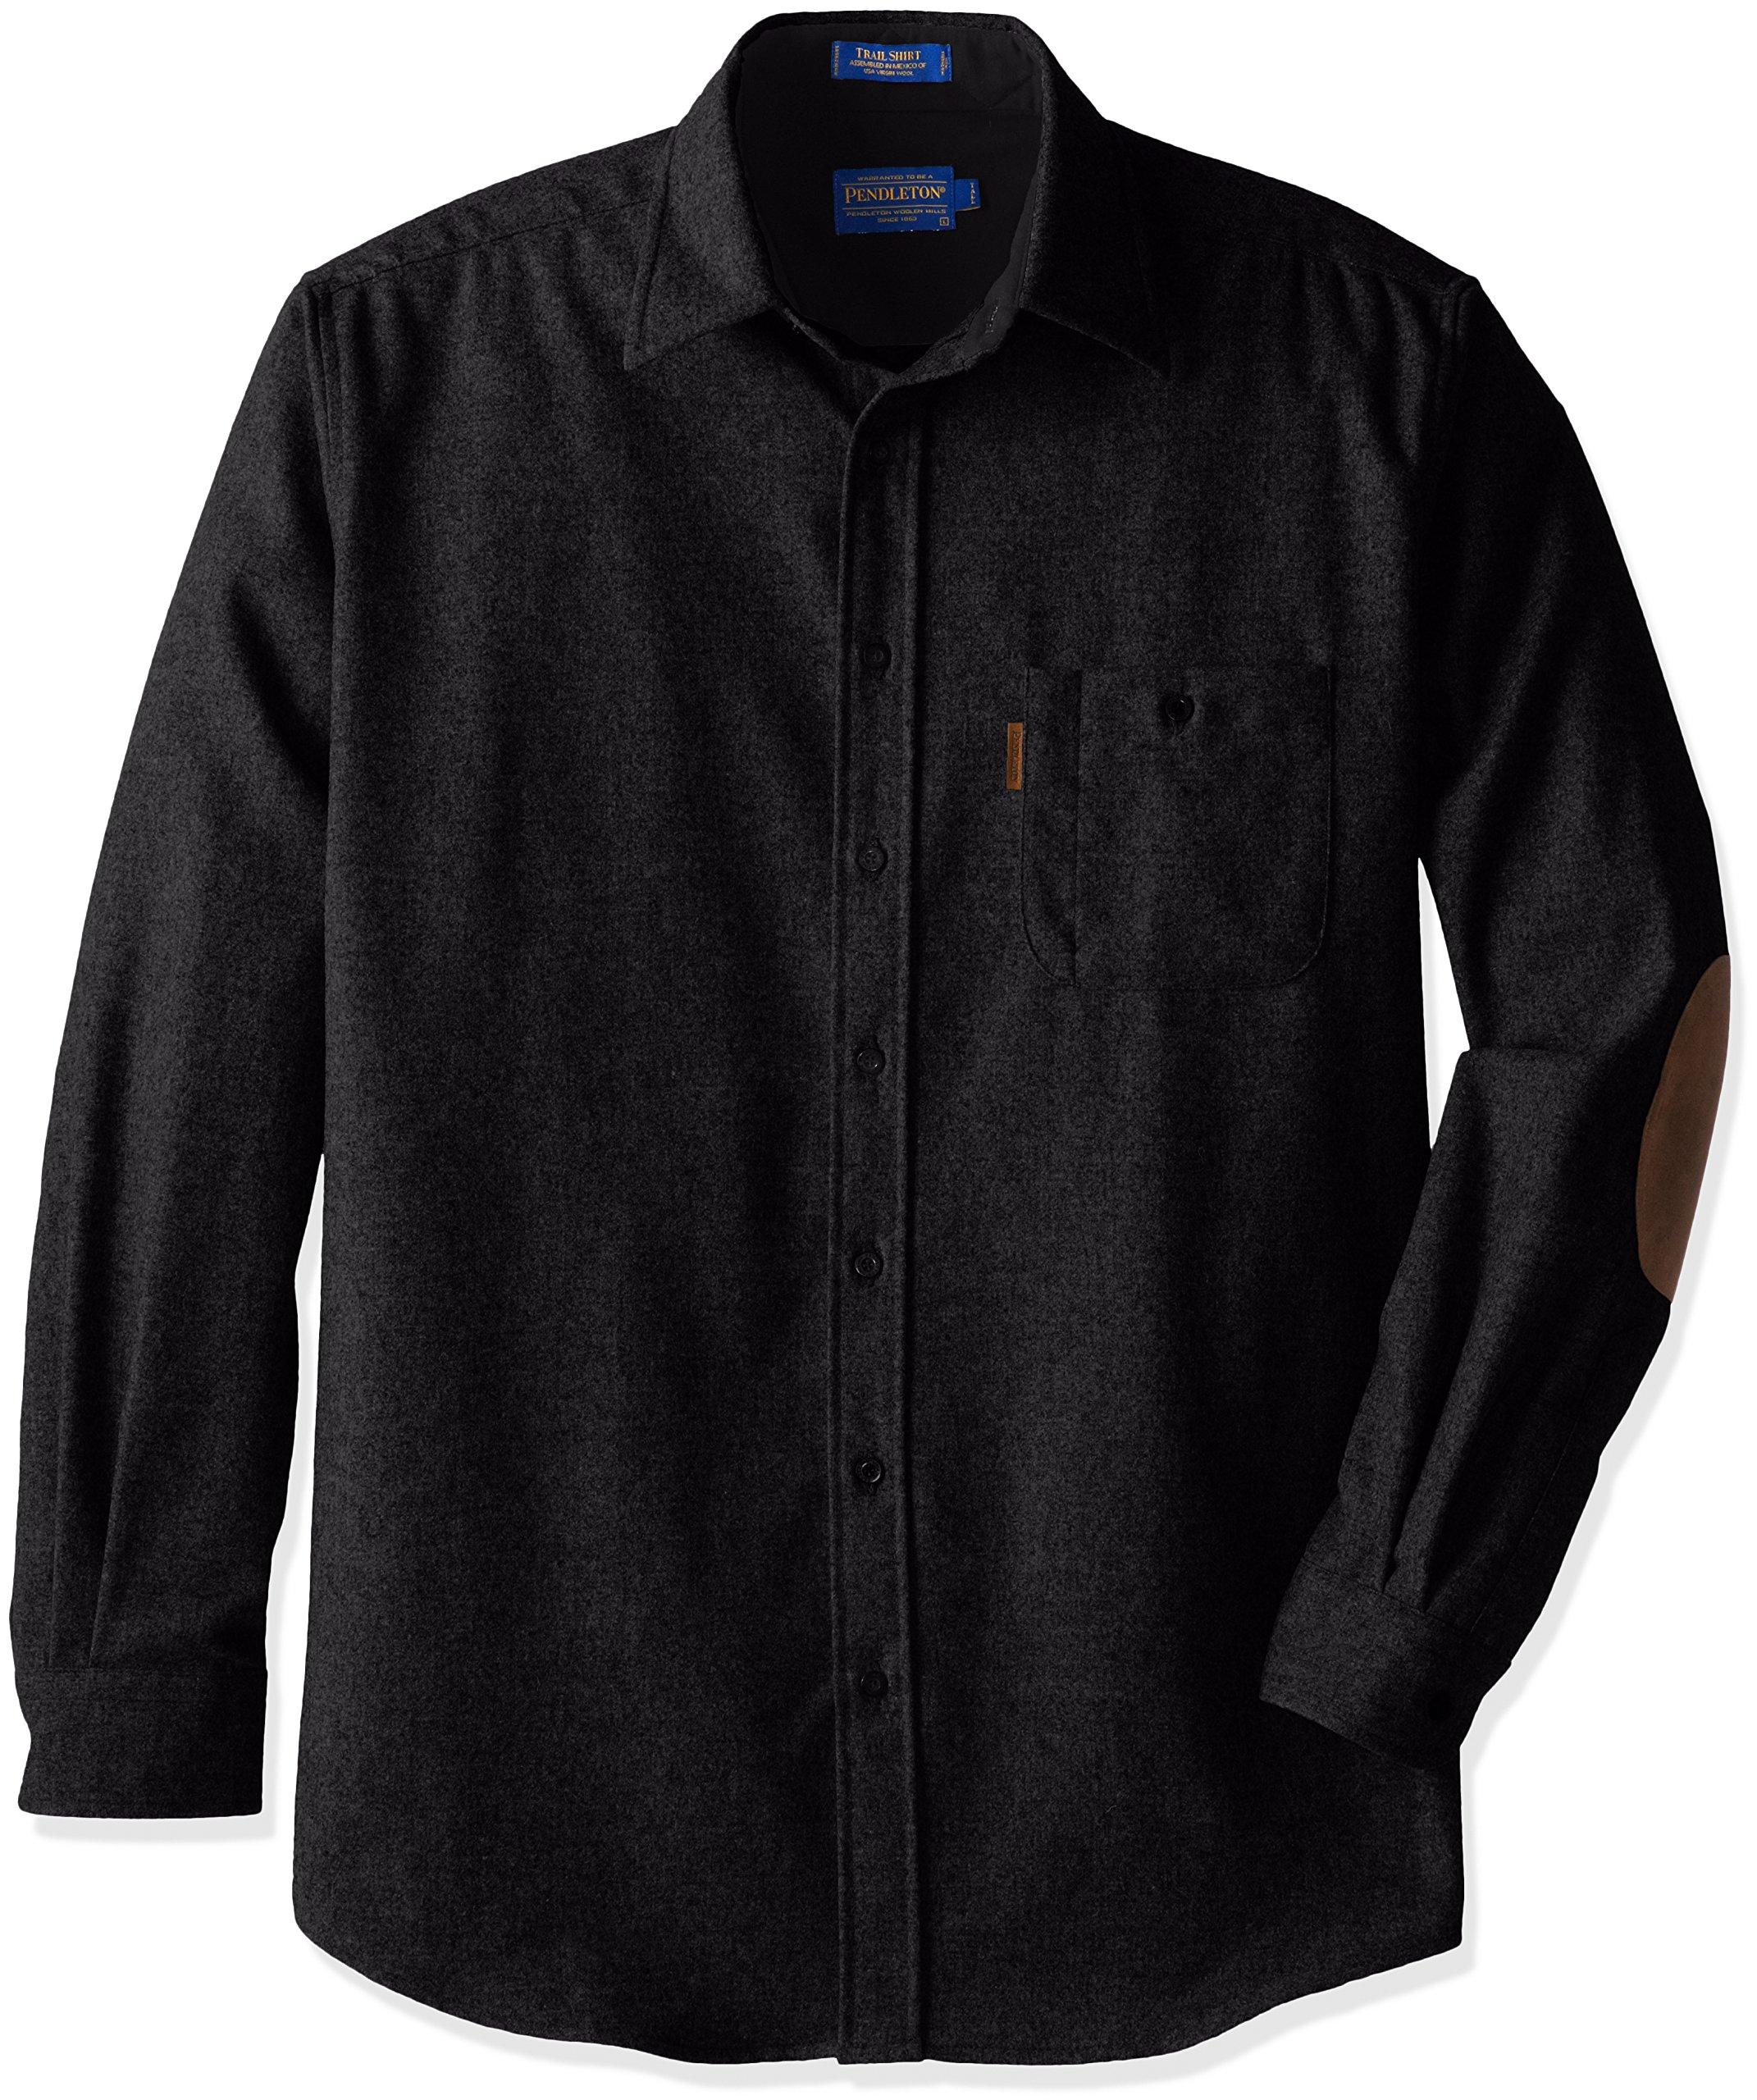 Pendleton Men's Big & Tall Long Sleeve Trail Shirt, Black, XX-Large/Tall